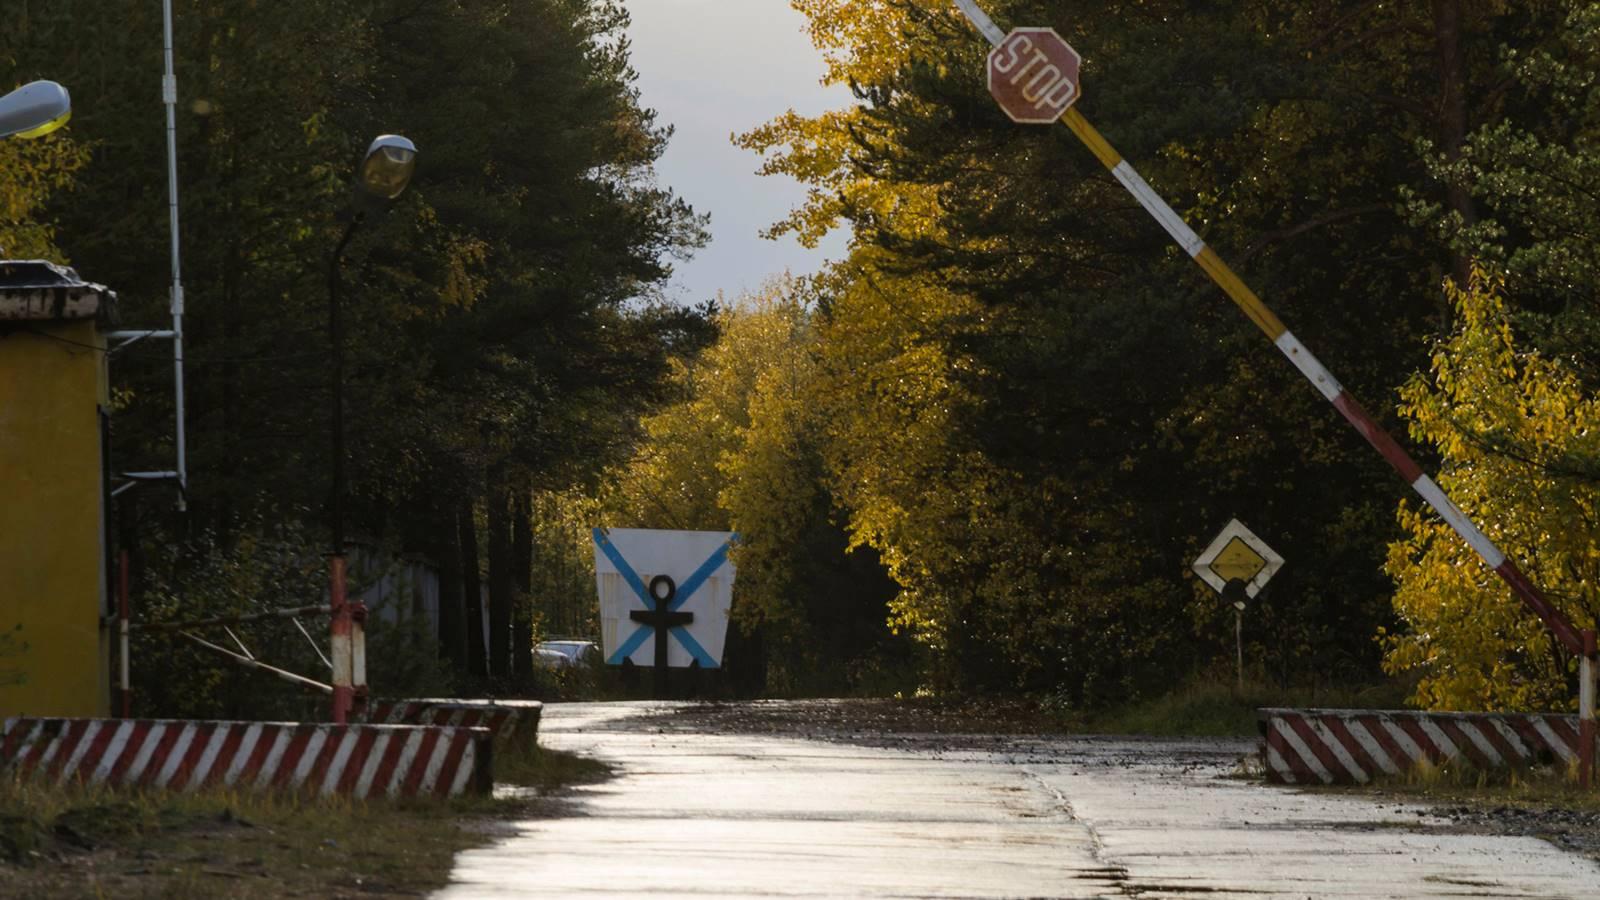 'Chernobyl 2019': Noruega detecta yodo radiactivo en frontera con Rusia tras explosión